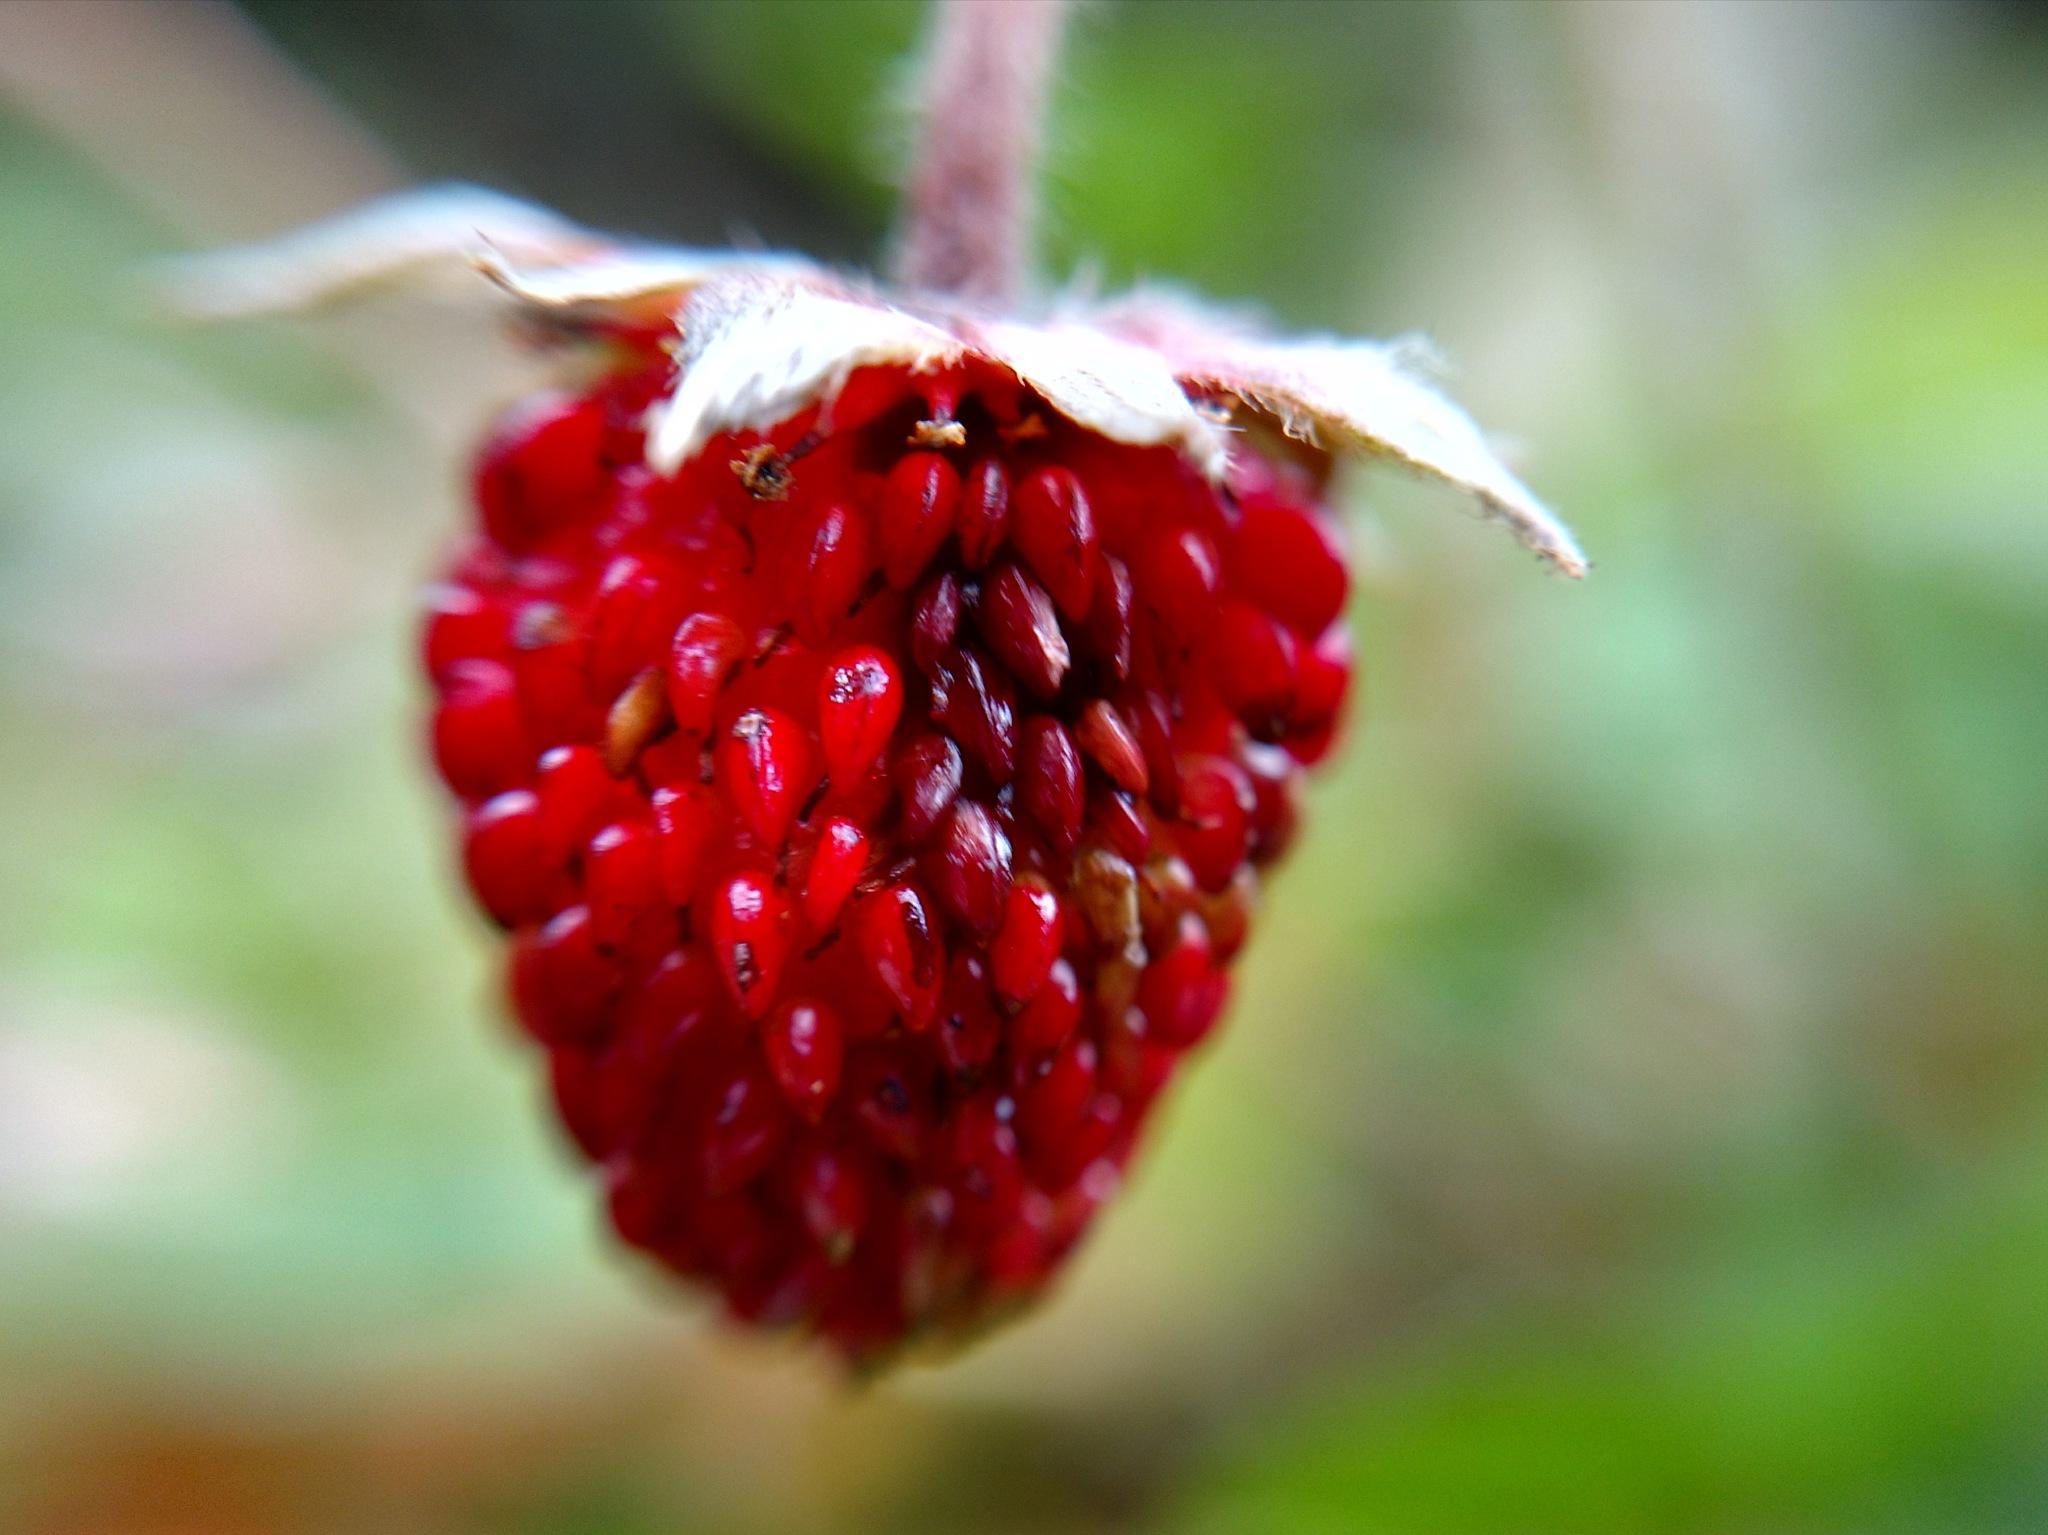 Strawberry by Catita Patino